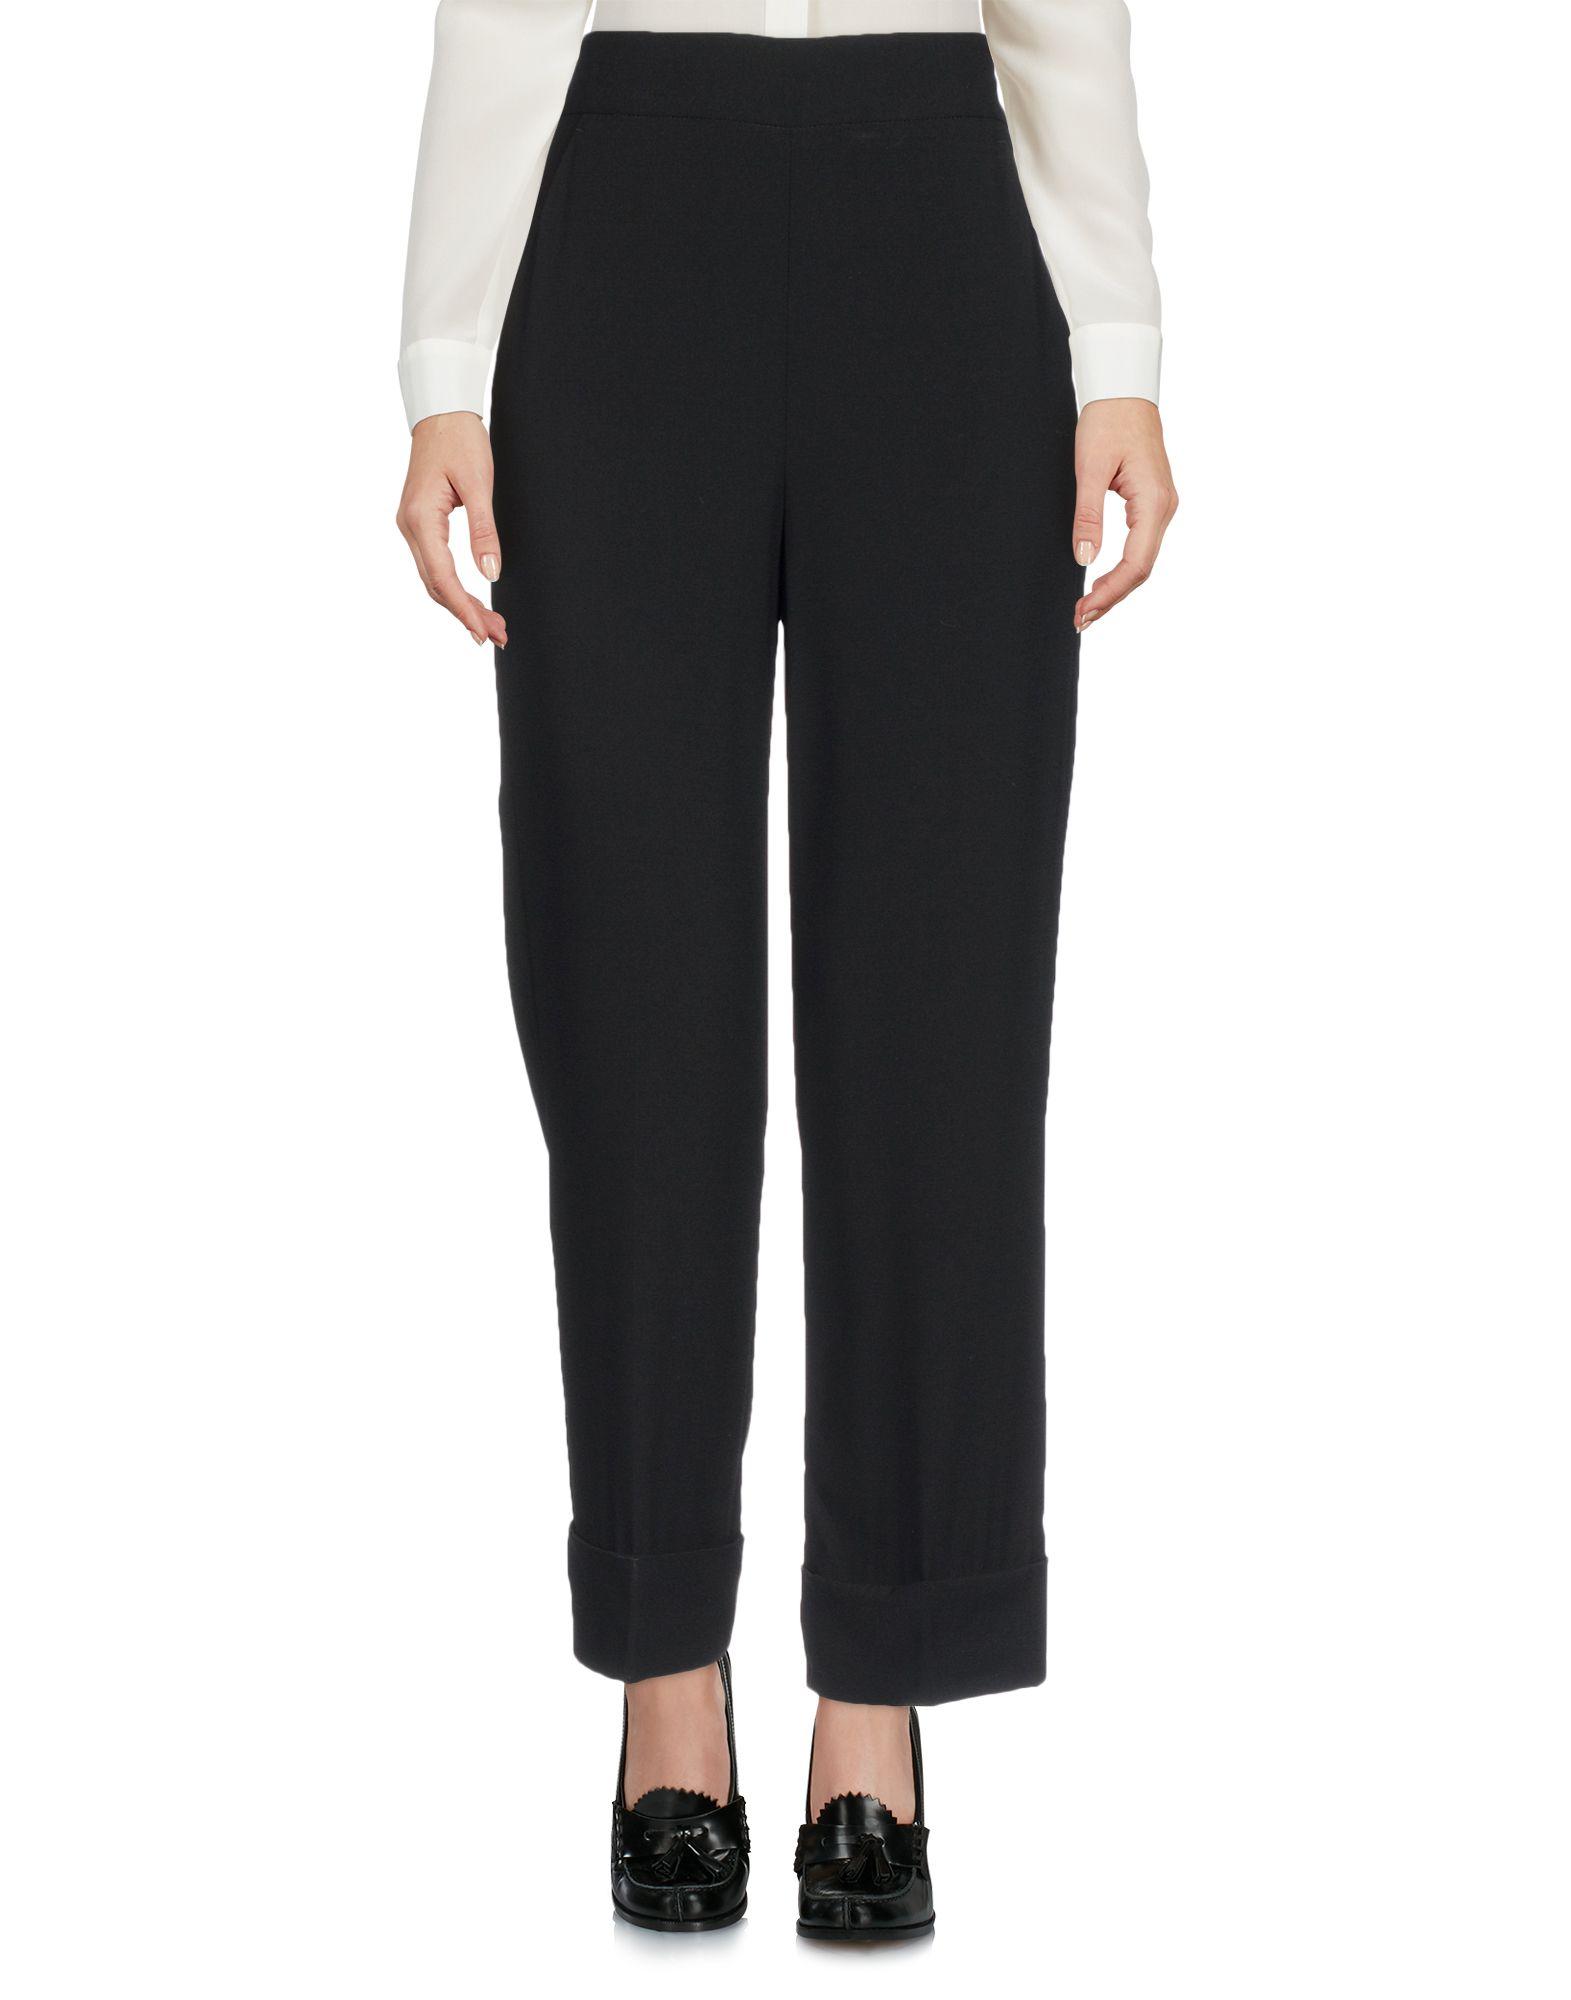 EMMA BRENDON | EMMA BRENDON 3/4-length shorts 13192391 | Goxip